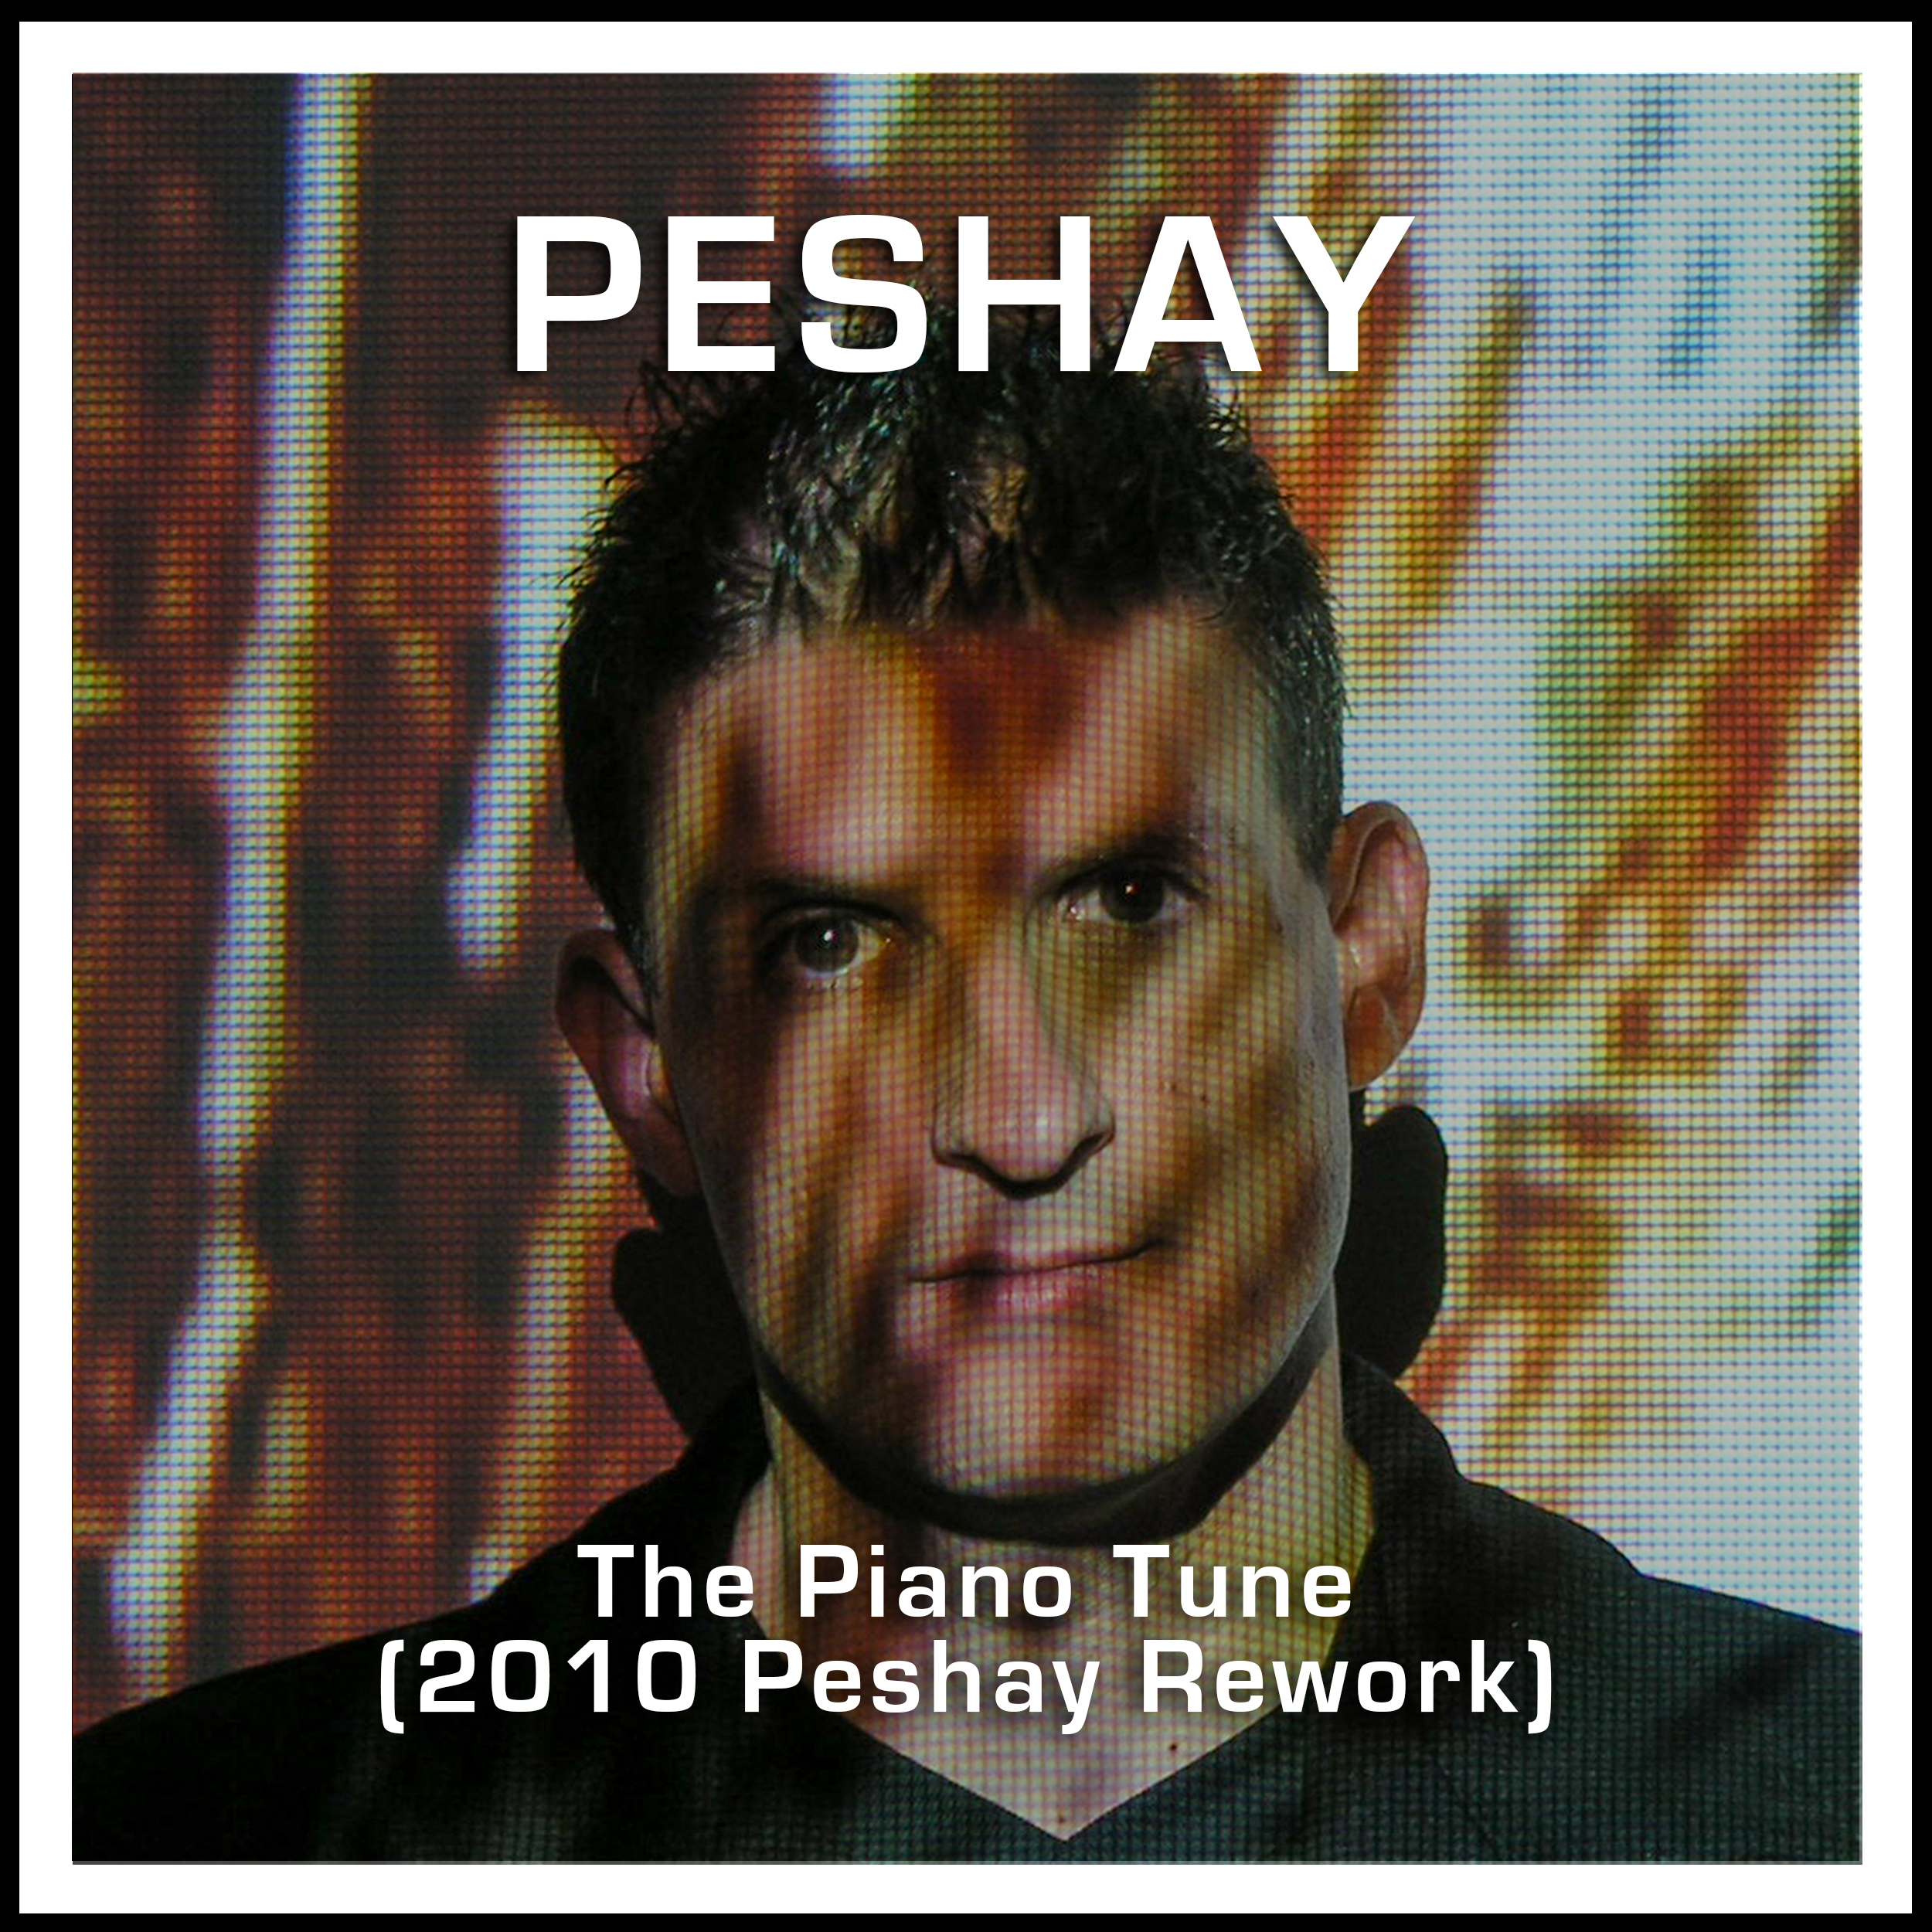 Peshay releases Piano Tune (2010 Peshay Rework)